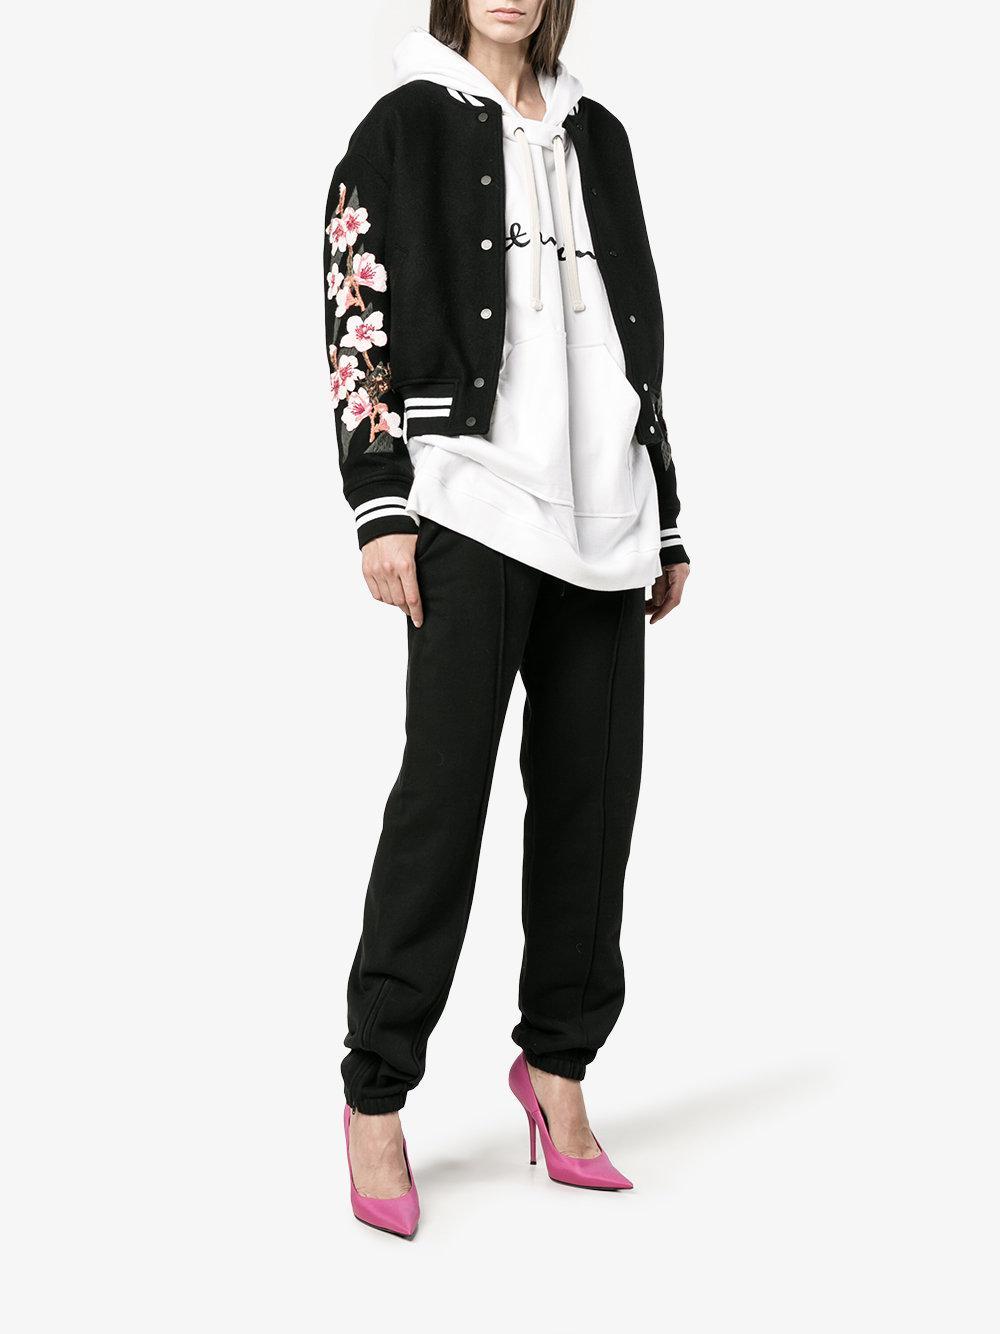 How to Combine Varsity Jacket